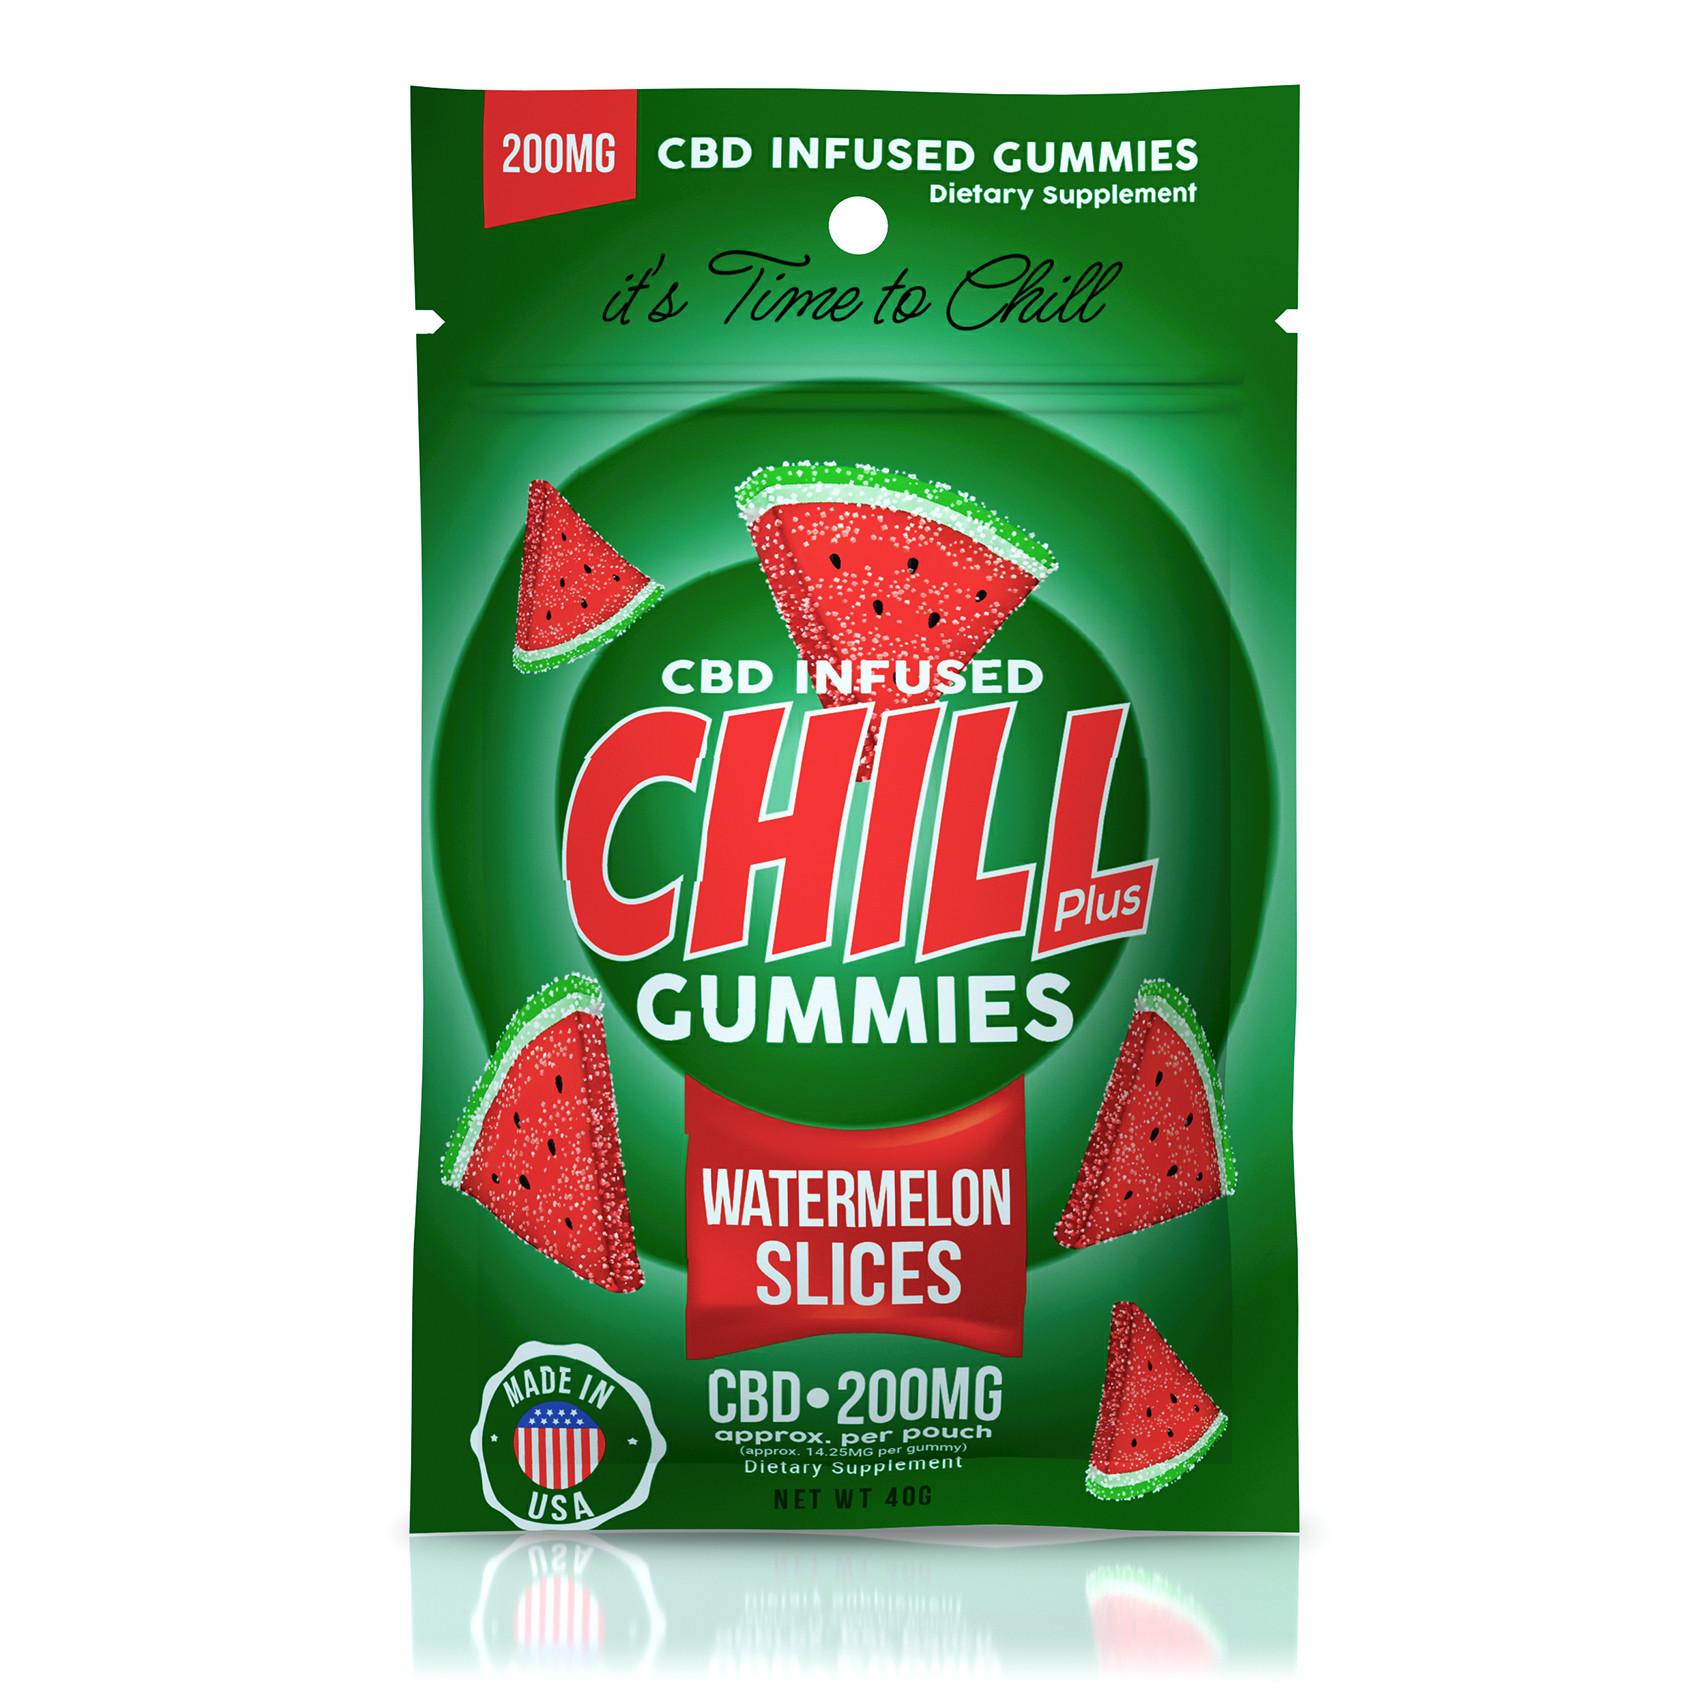 chill-plus-gummies-cbd-infused-watermelon-slices-200mg